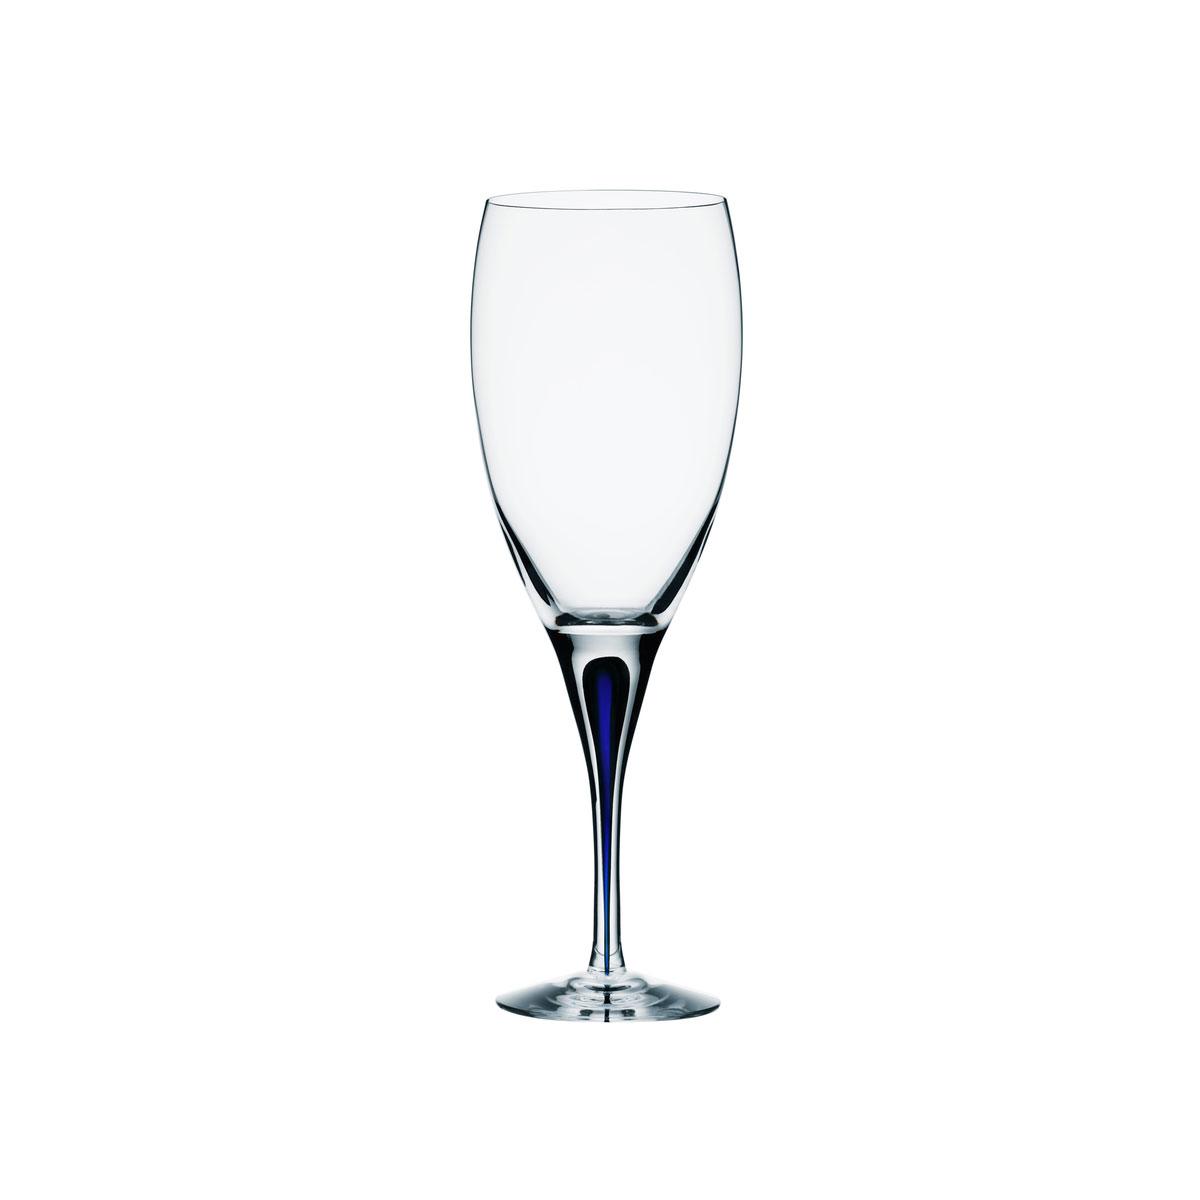 Orrefors Crystal, Intermezzo Blue Crystal Wine Claret, Single